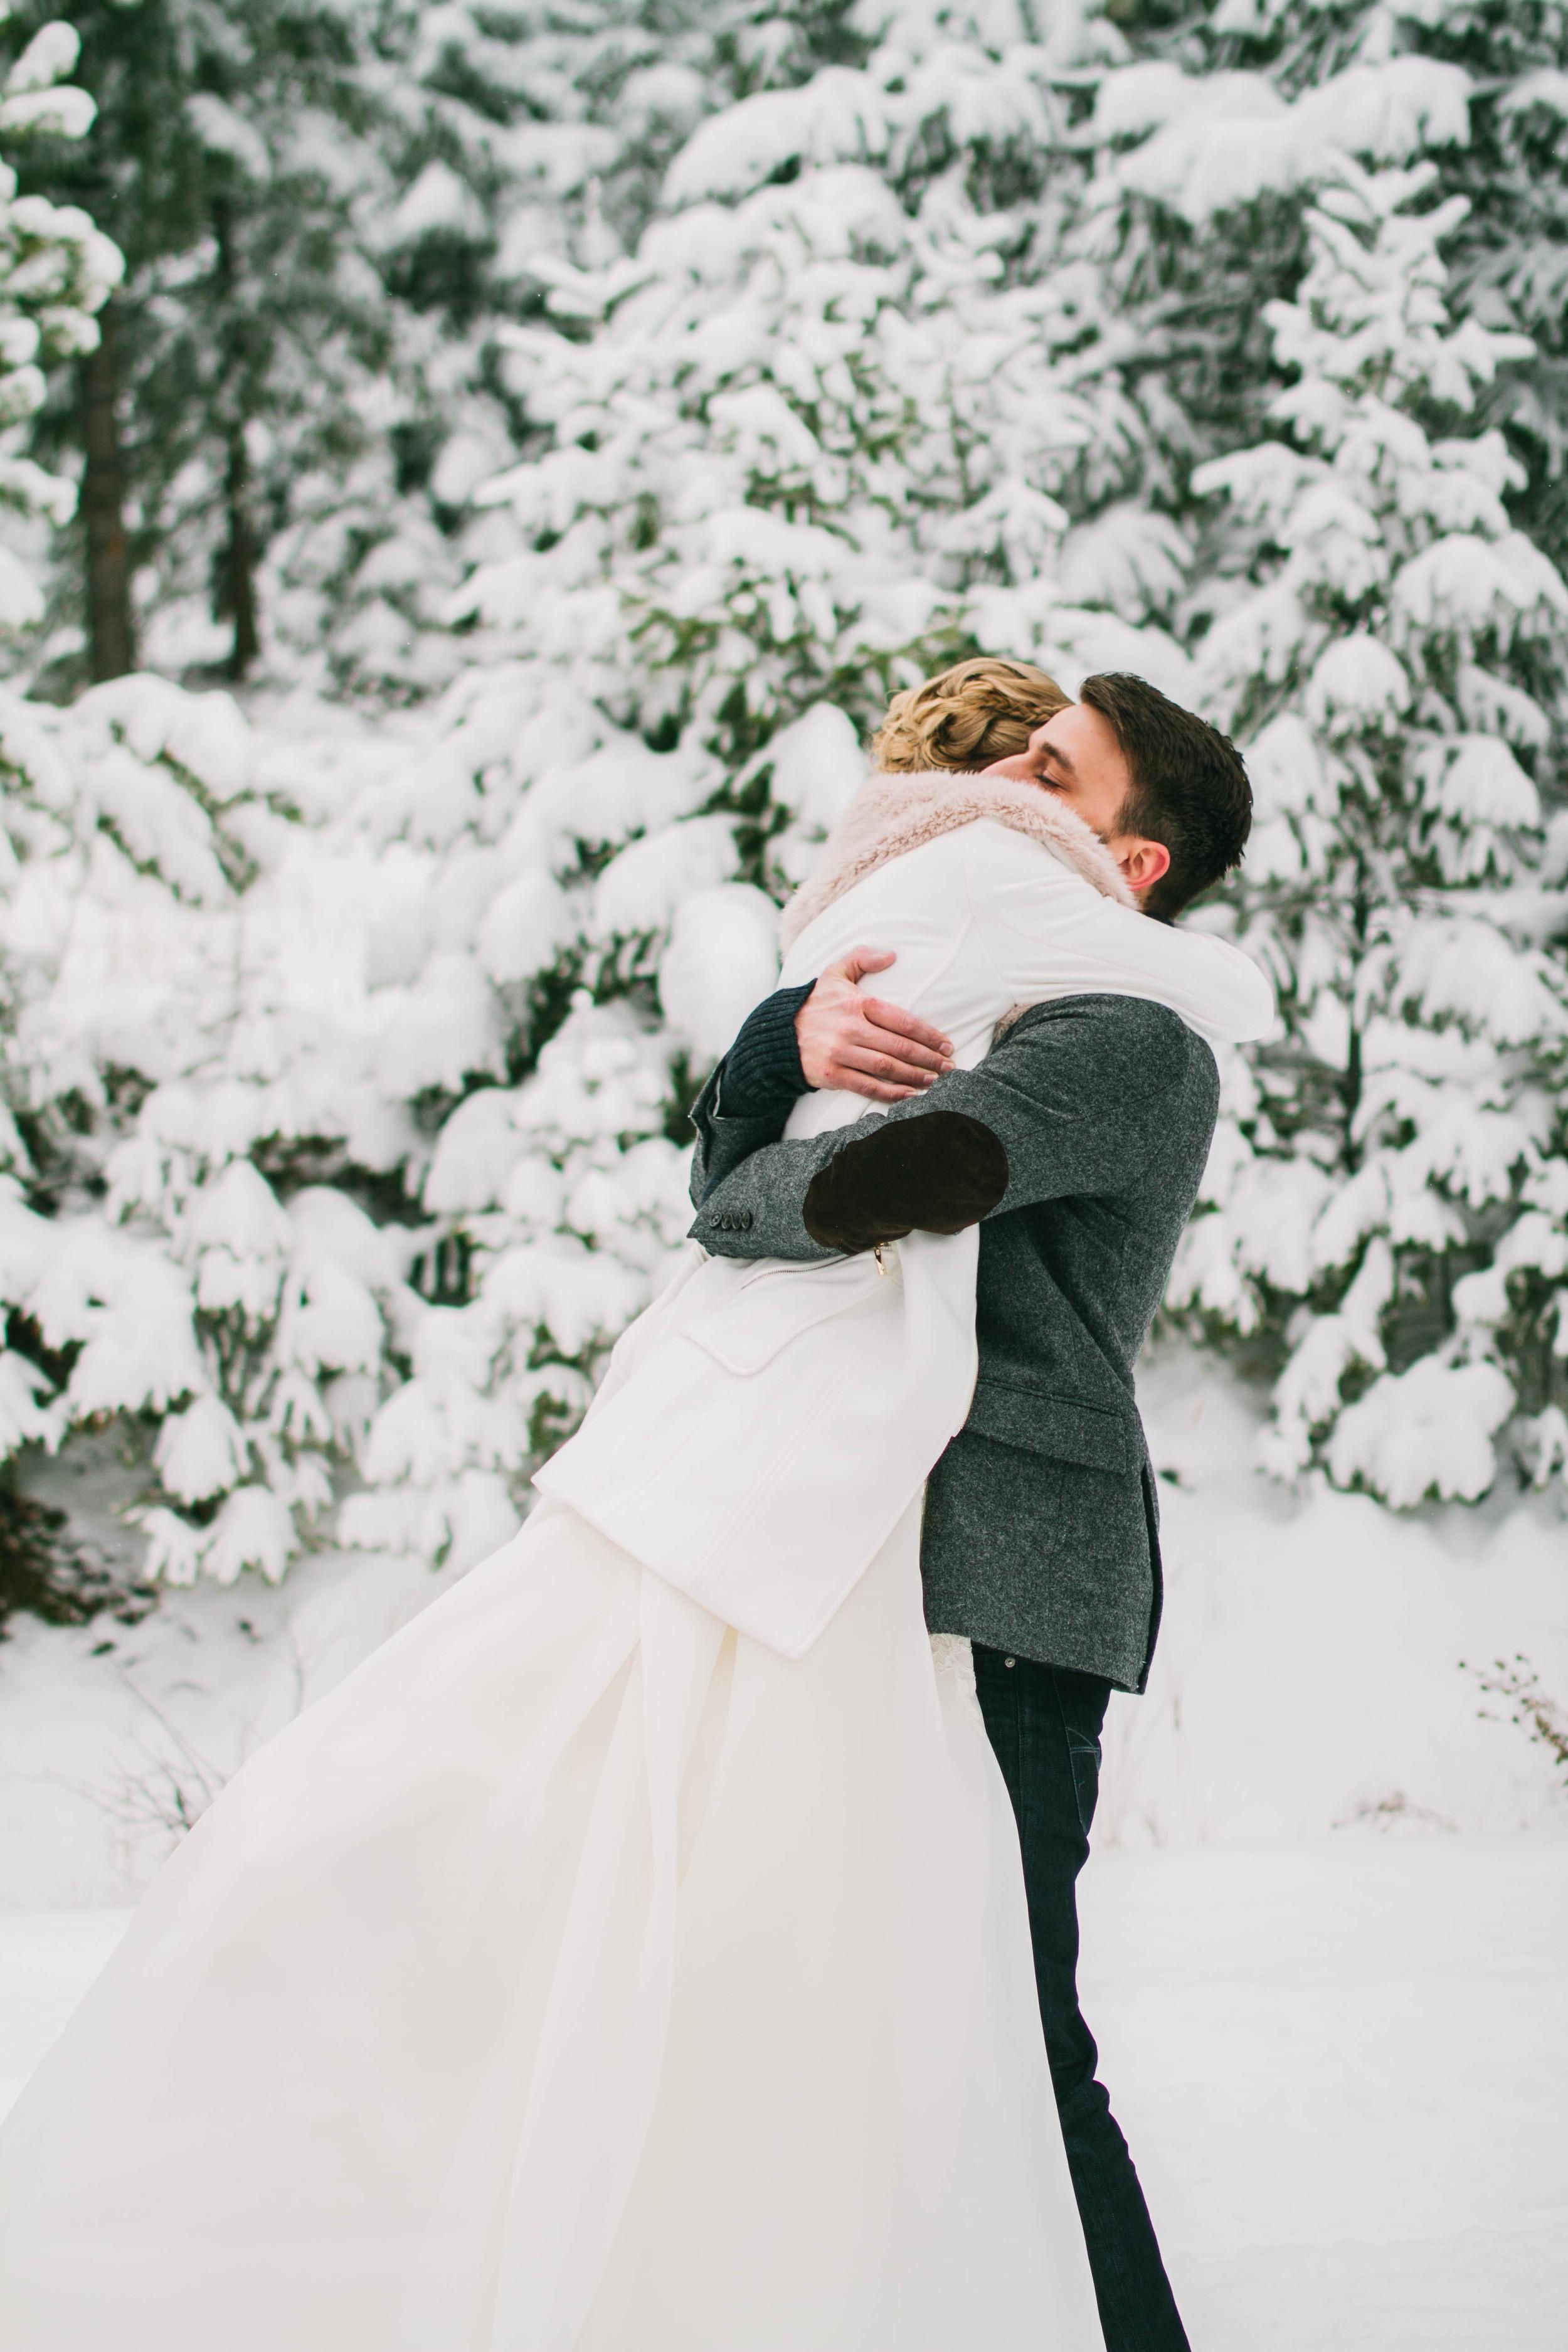 Bonin Wedding - Madeleine Bonin Photography-5724.jpg